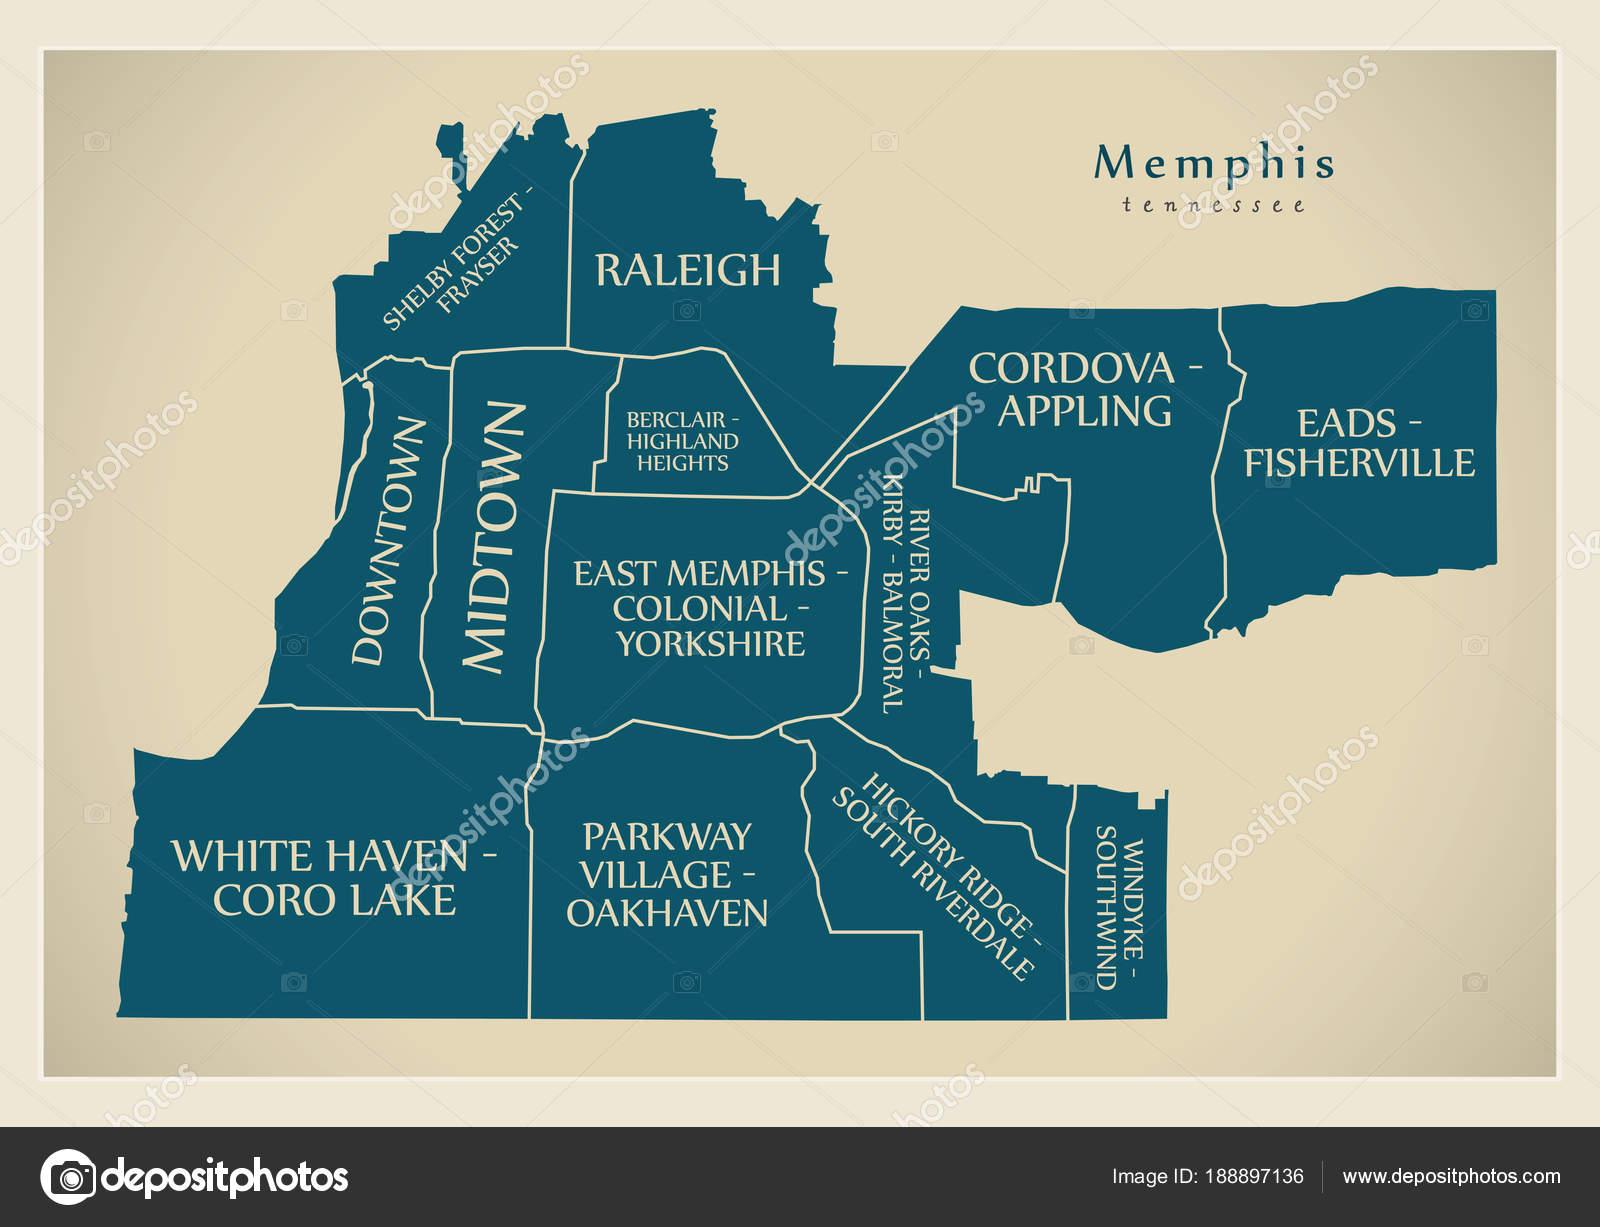 Moderne City Map - Memphis Tennessee Stadt der Usa mit ...